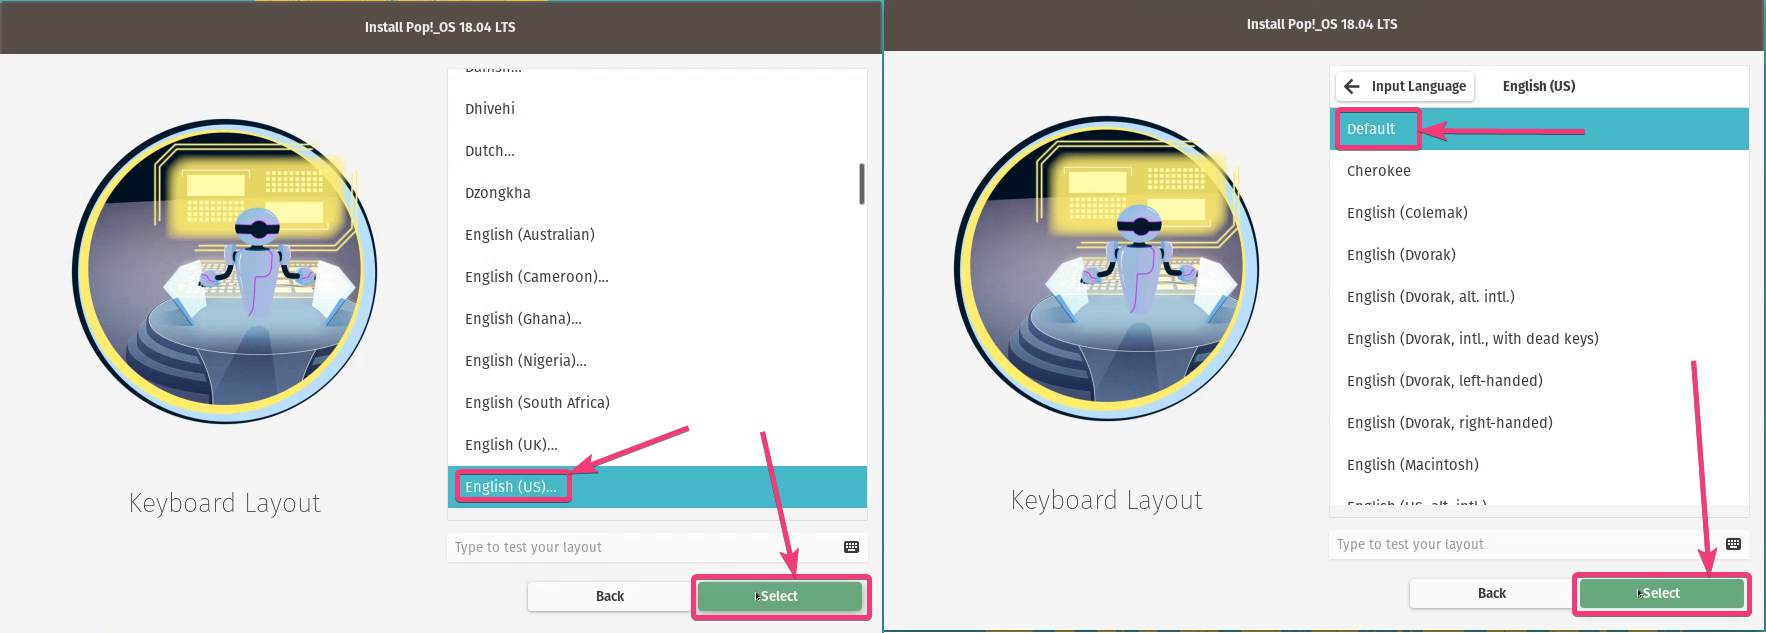 Choose the keyboard layout,